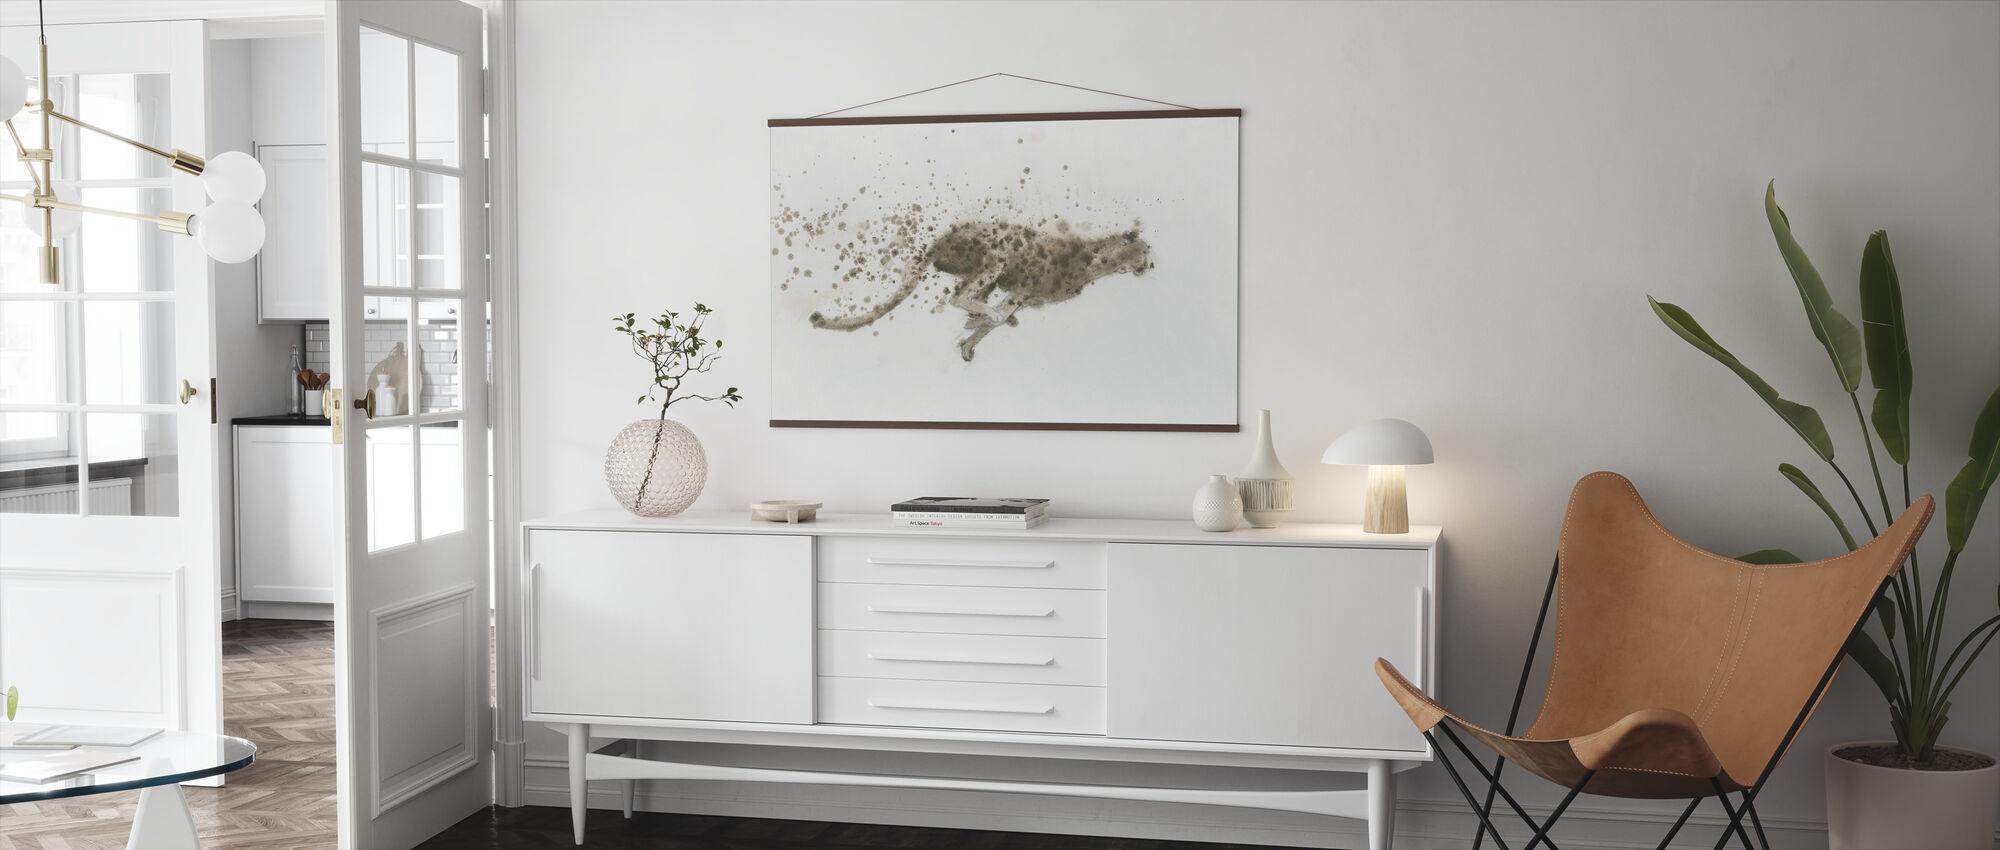 Cheetah - Poster - Living Room